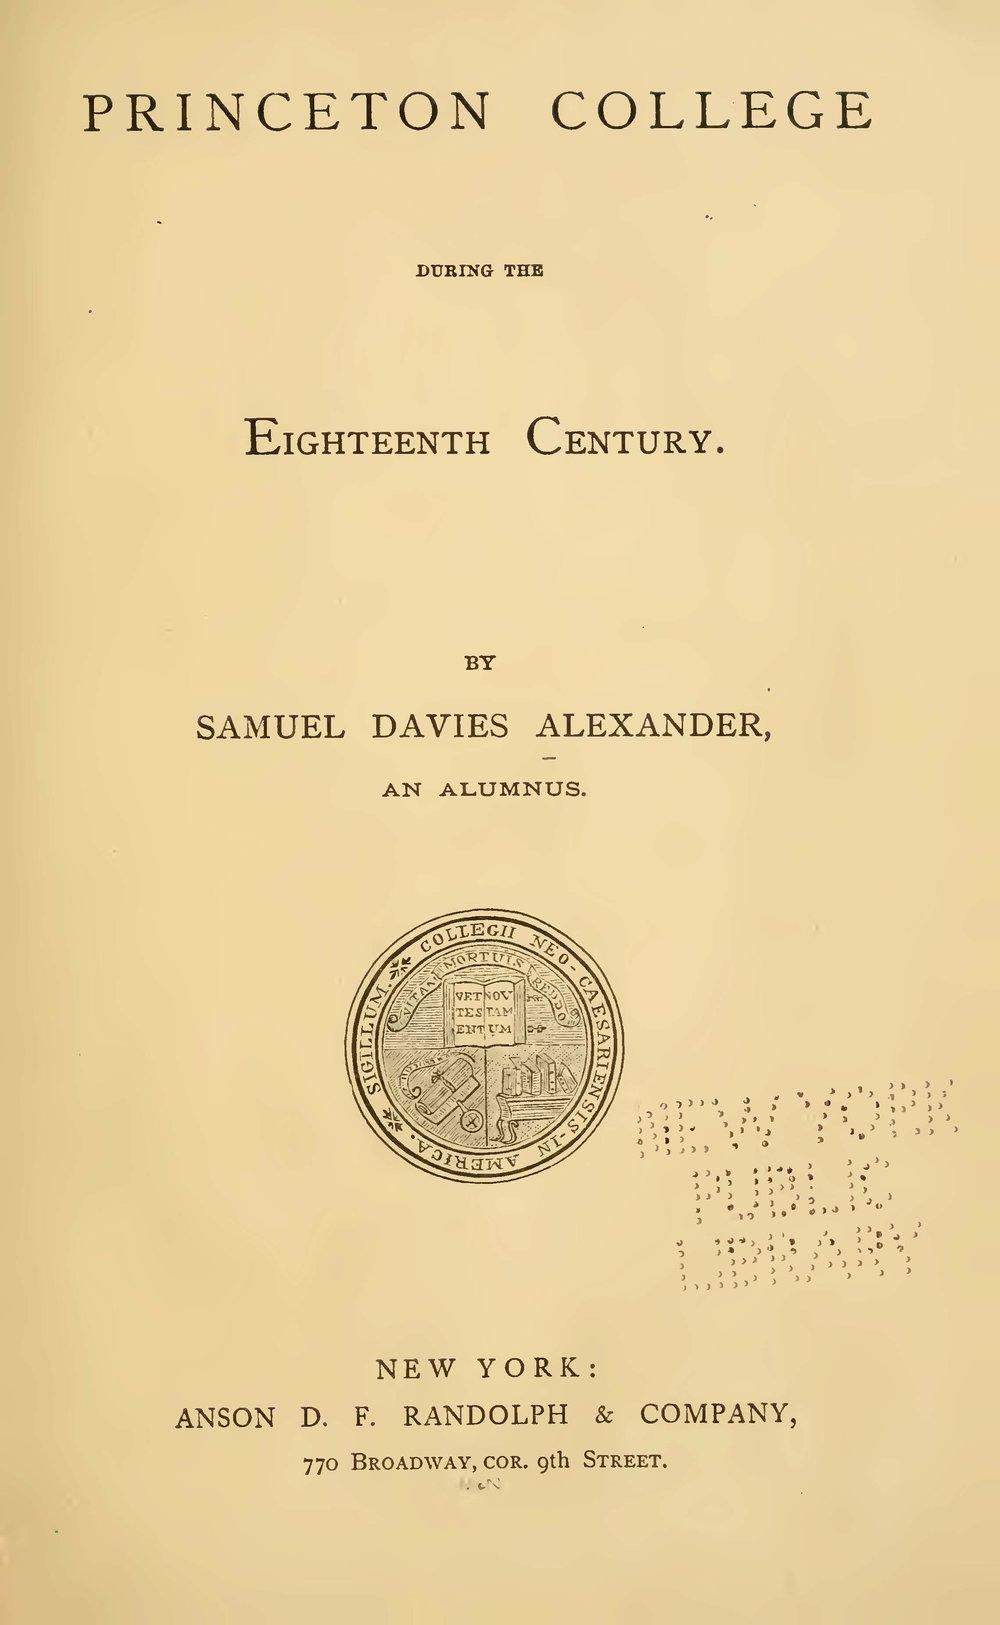 Alexander, Samuel Davies, Princeton College During the Eighteenth Century Title Page.jpg